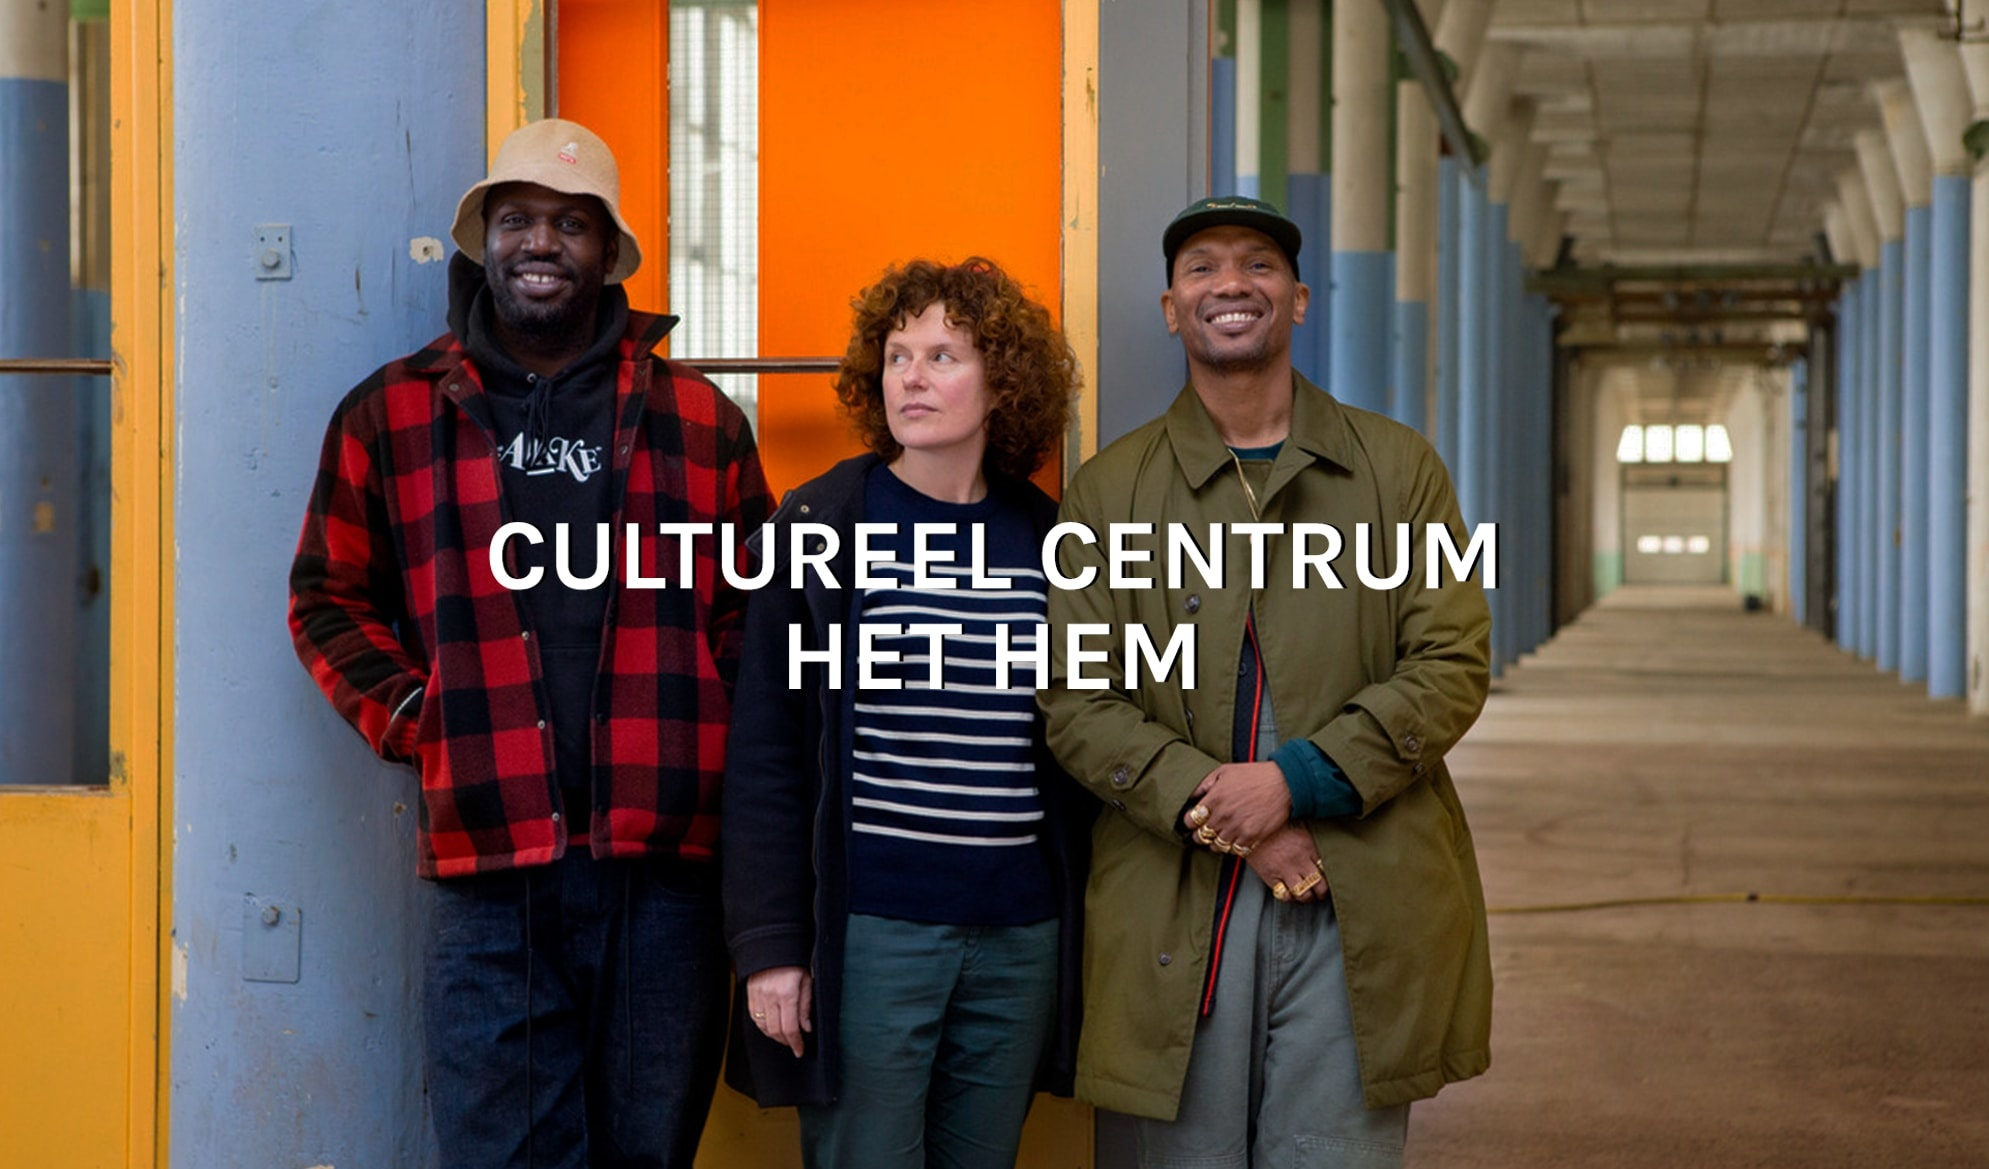 Cultureel Centrum Het Hem